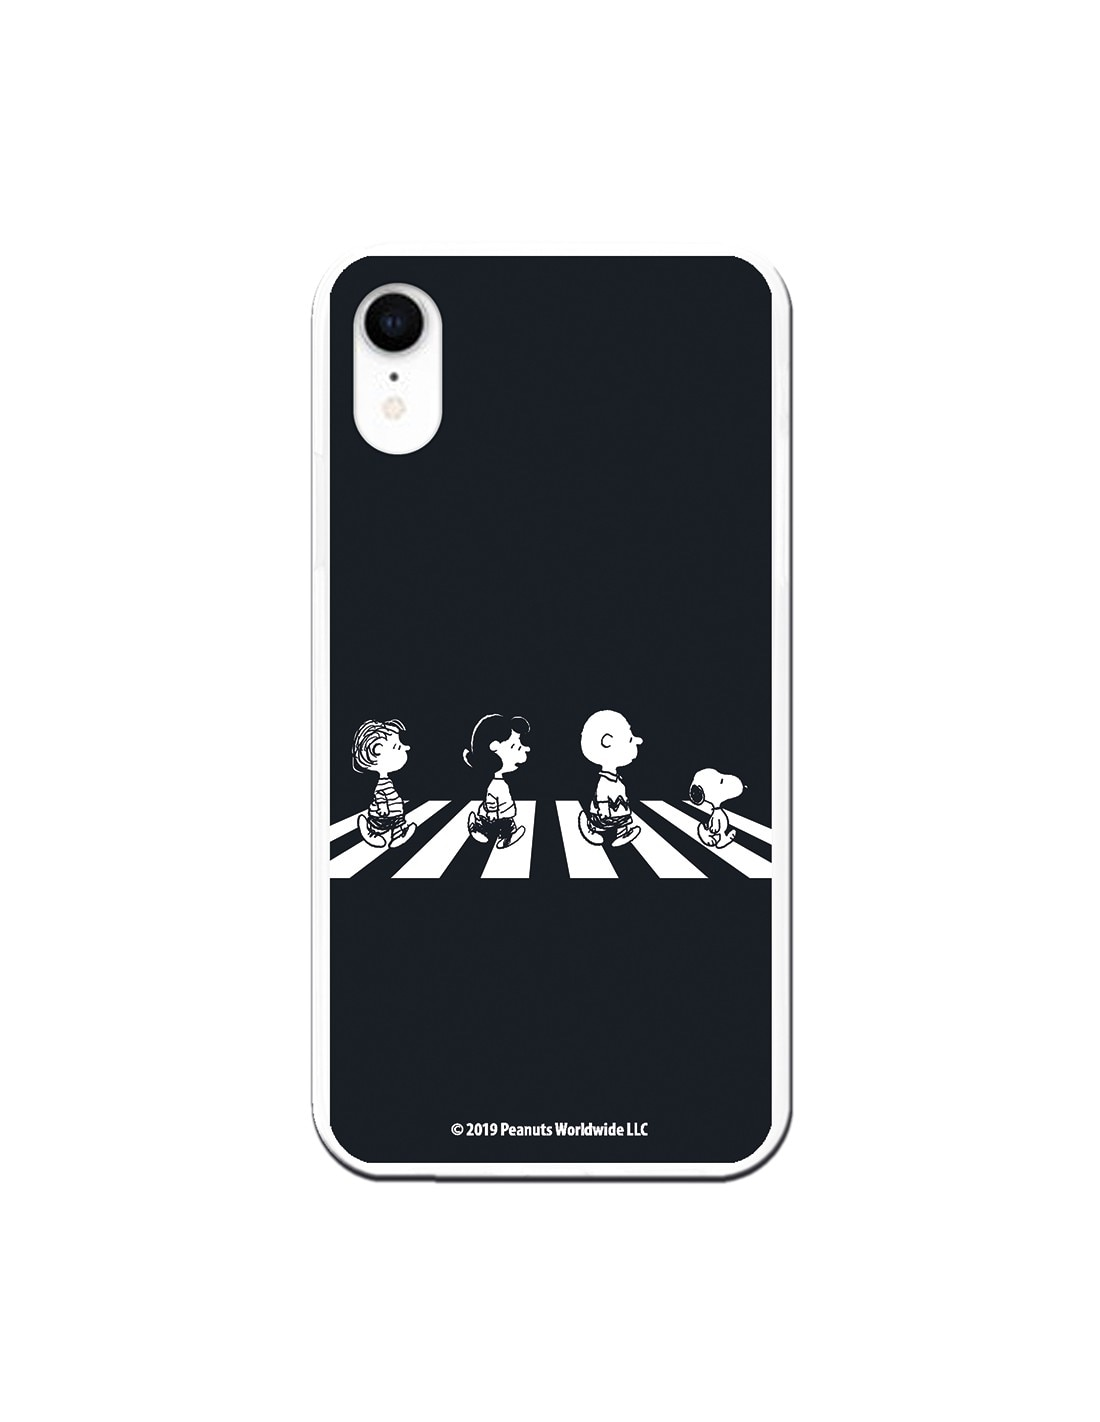 Funda para iPhone XR Oficial de Peanuts Personajes Beatles - Snoopy